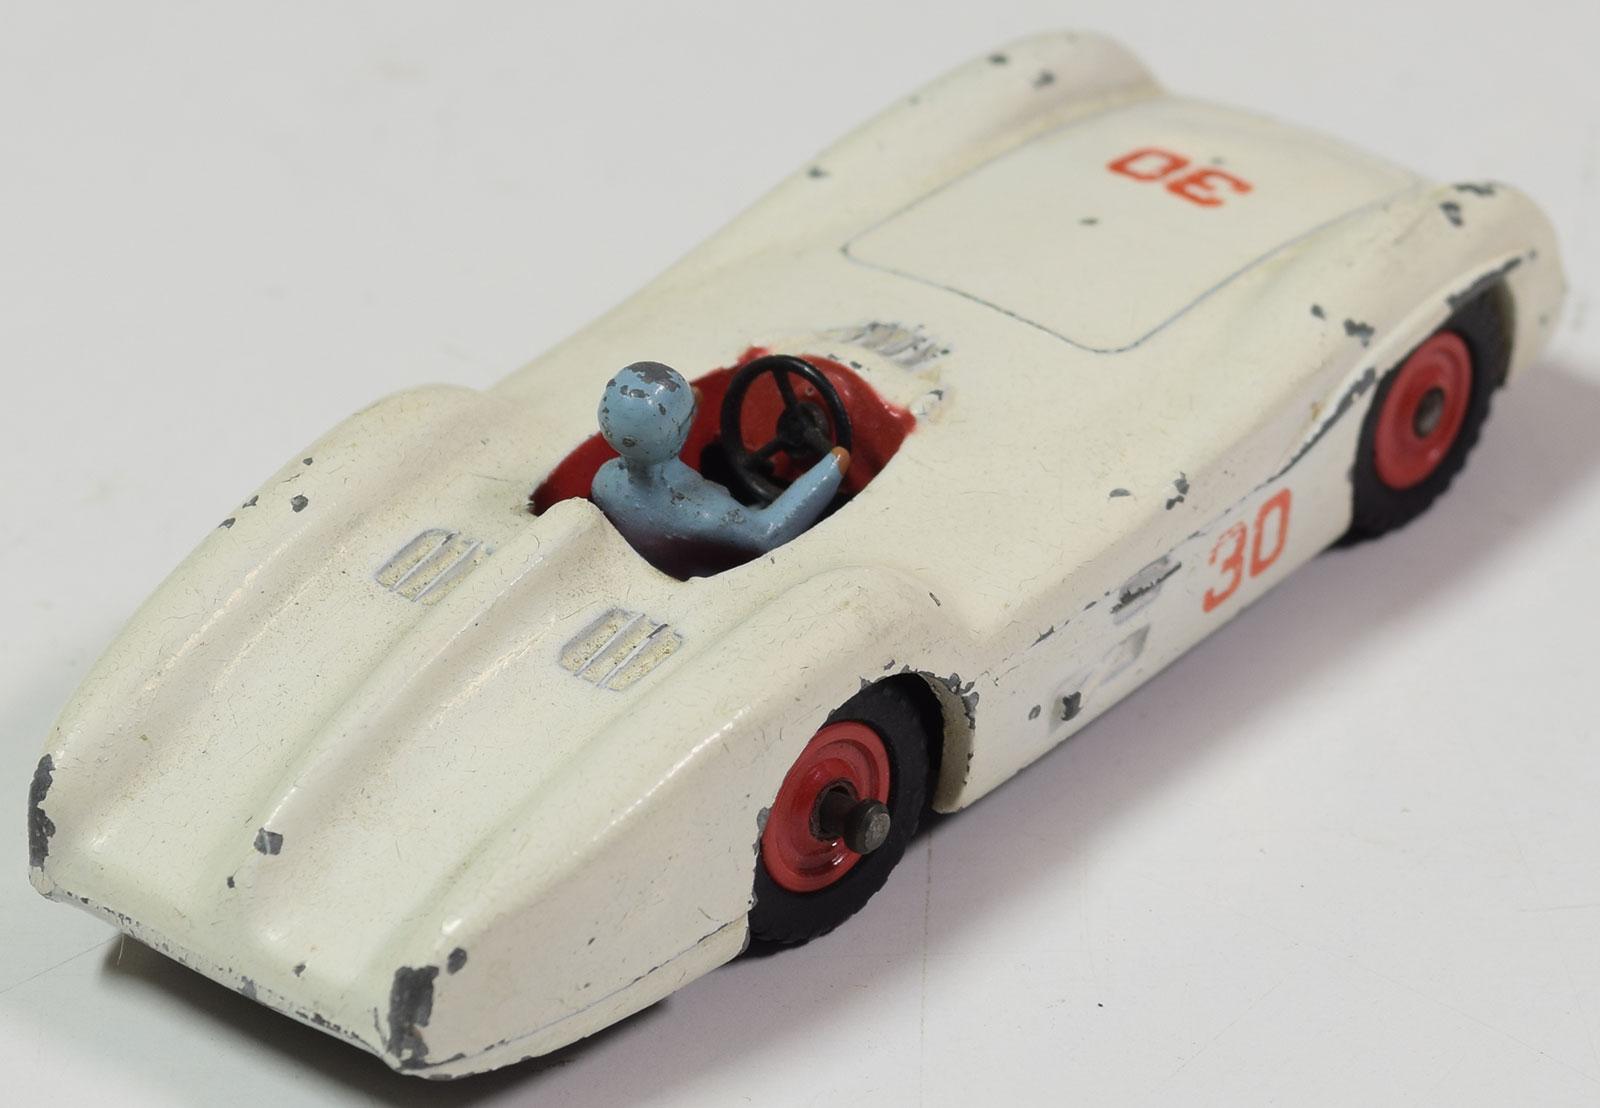 Dinky 1962 DINKY #237 MERCEDES BENZ RACER, CREAM, RED PLASTIC HUBS, BLUE DRIVER-FAIR